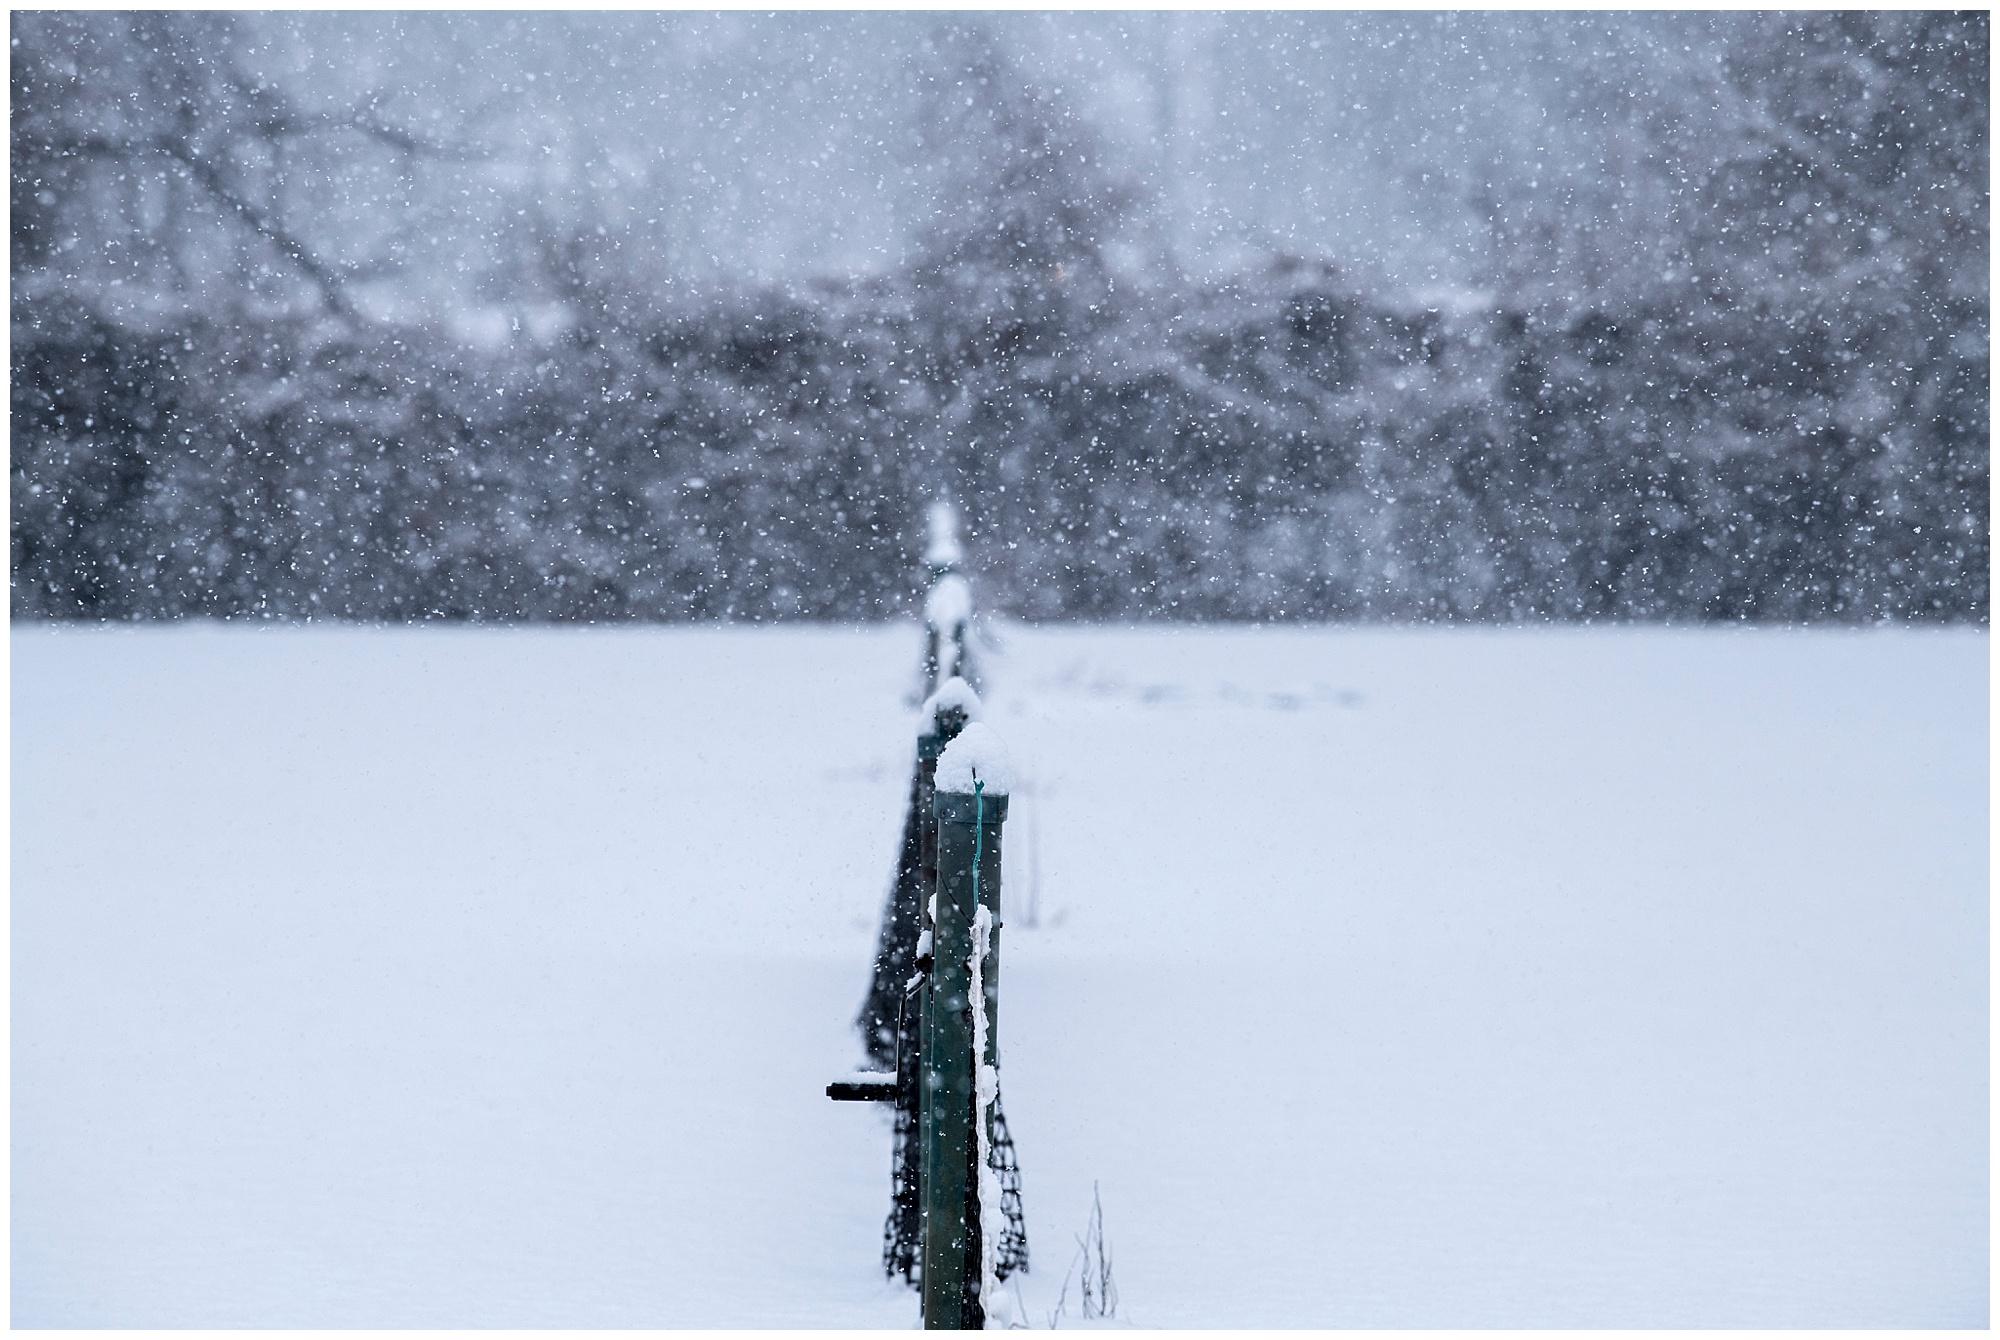 KielinskiPhotographers_snowday_tenniscourts_2018-01-01_0011.jpg